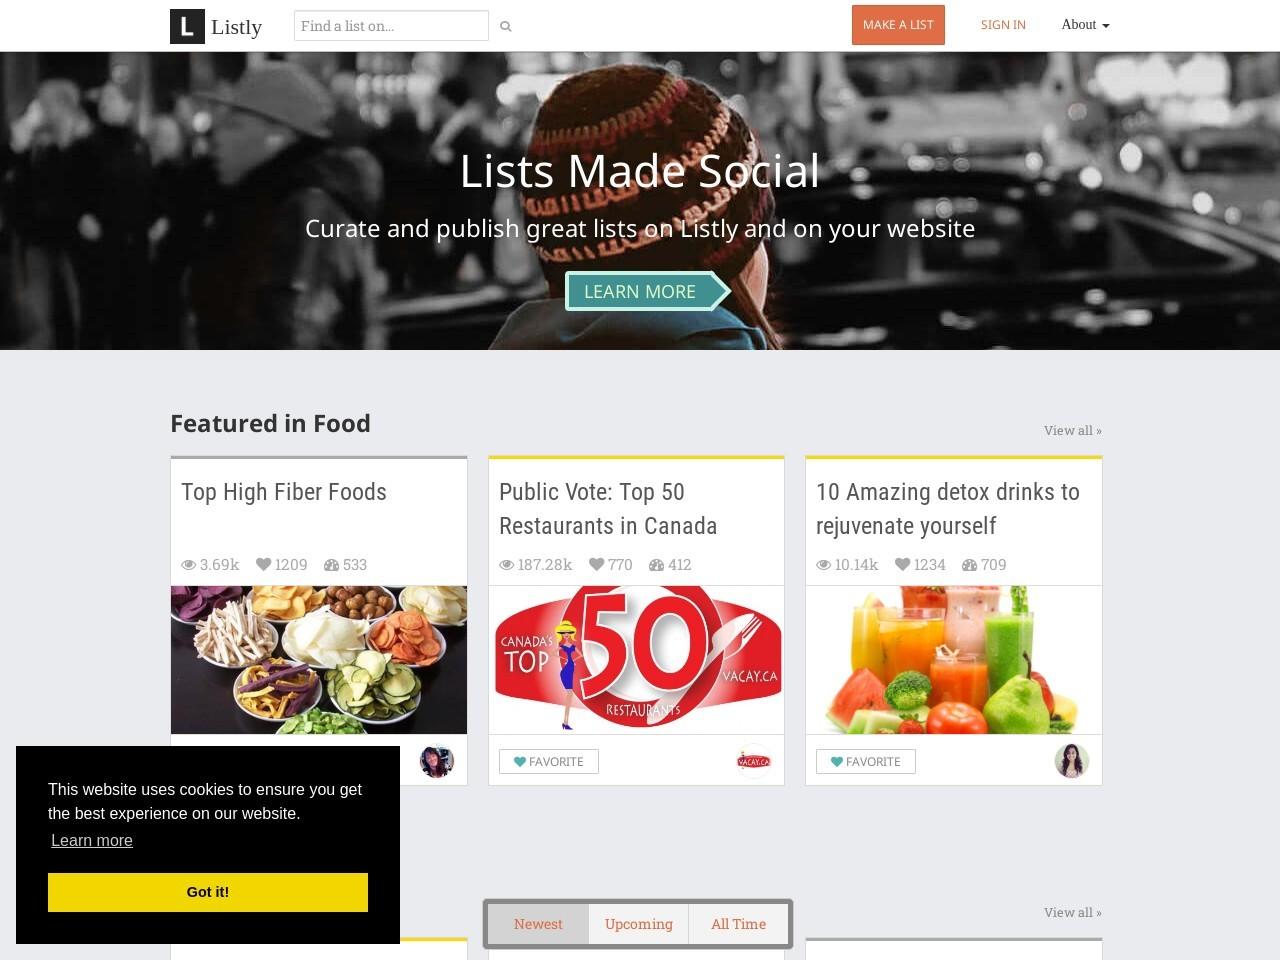 Website Design Services to Improve Business Exposure Online | cWebConsultants